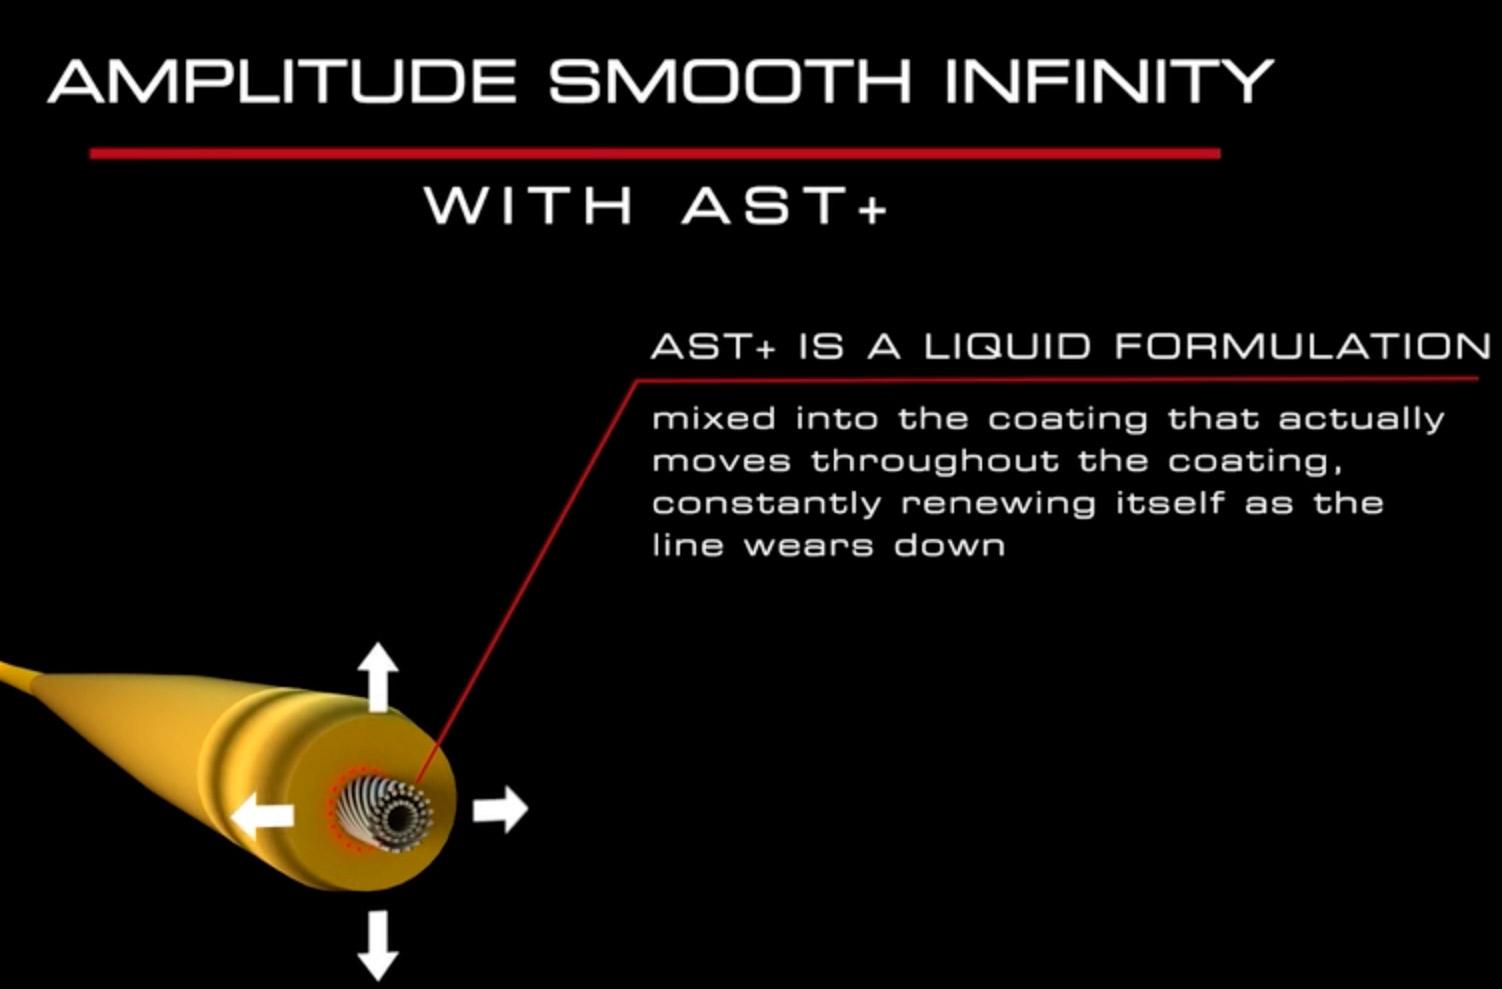 amplitude-smooth-infinity